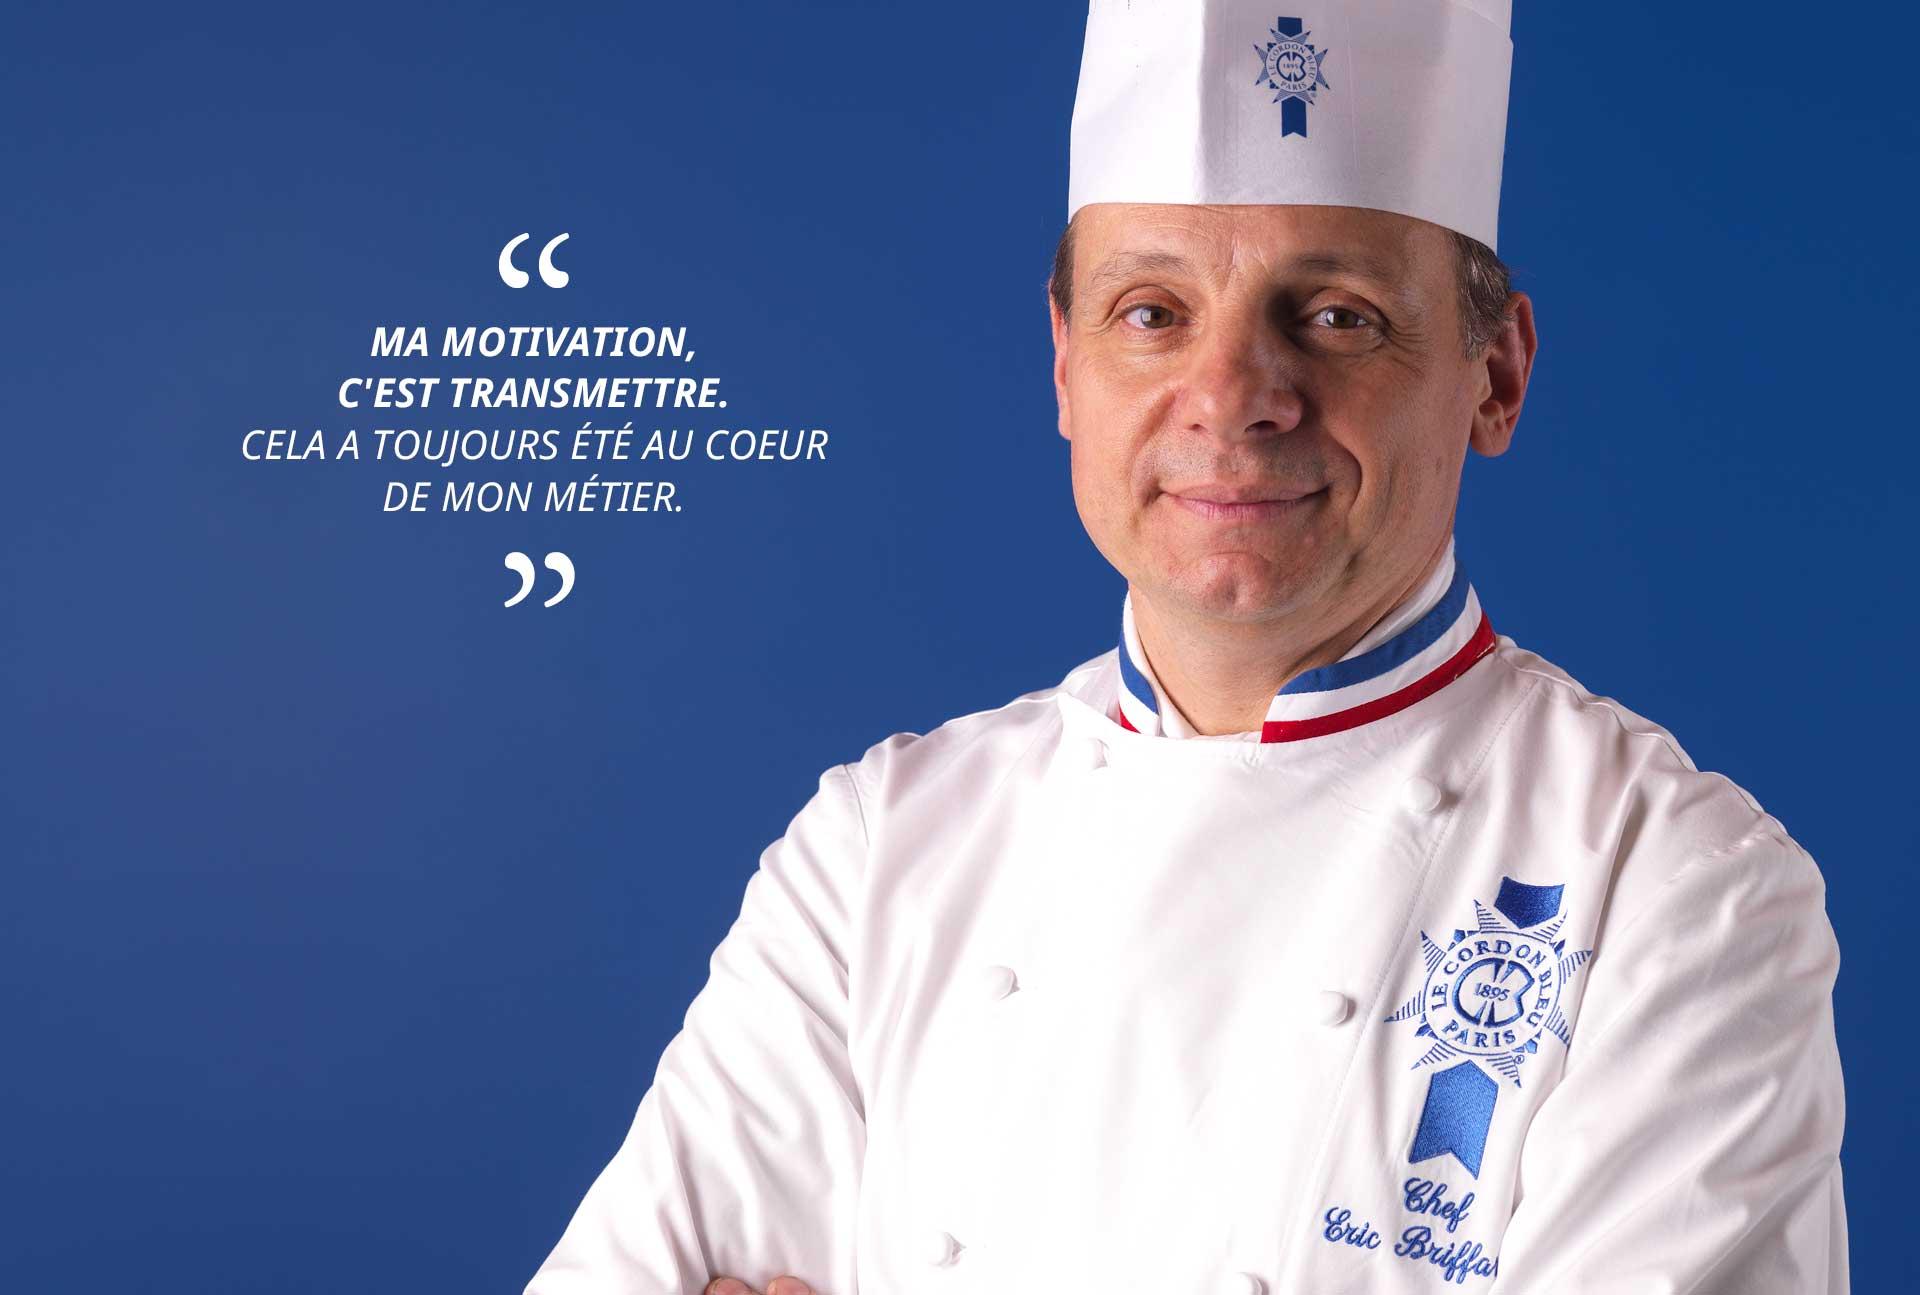 Eric Briffard, directeur arts culinaires Le Cordon Bleu Paris